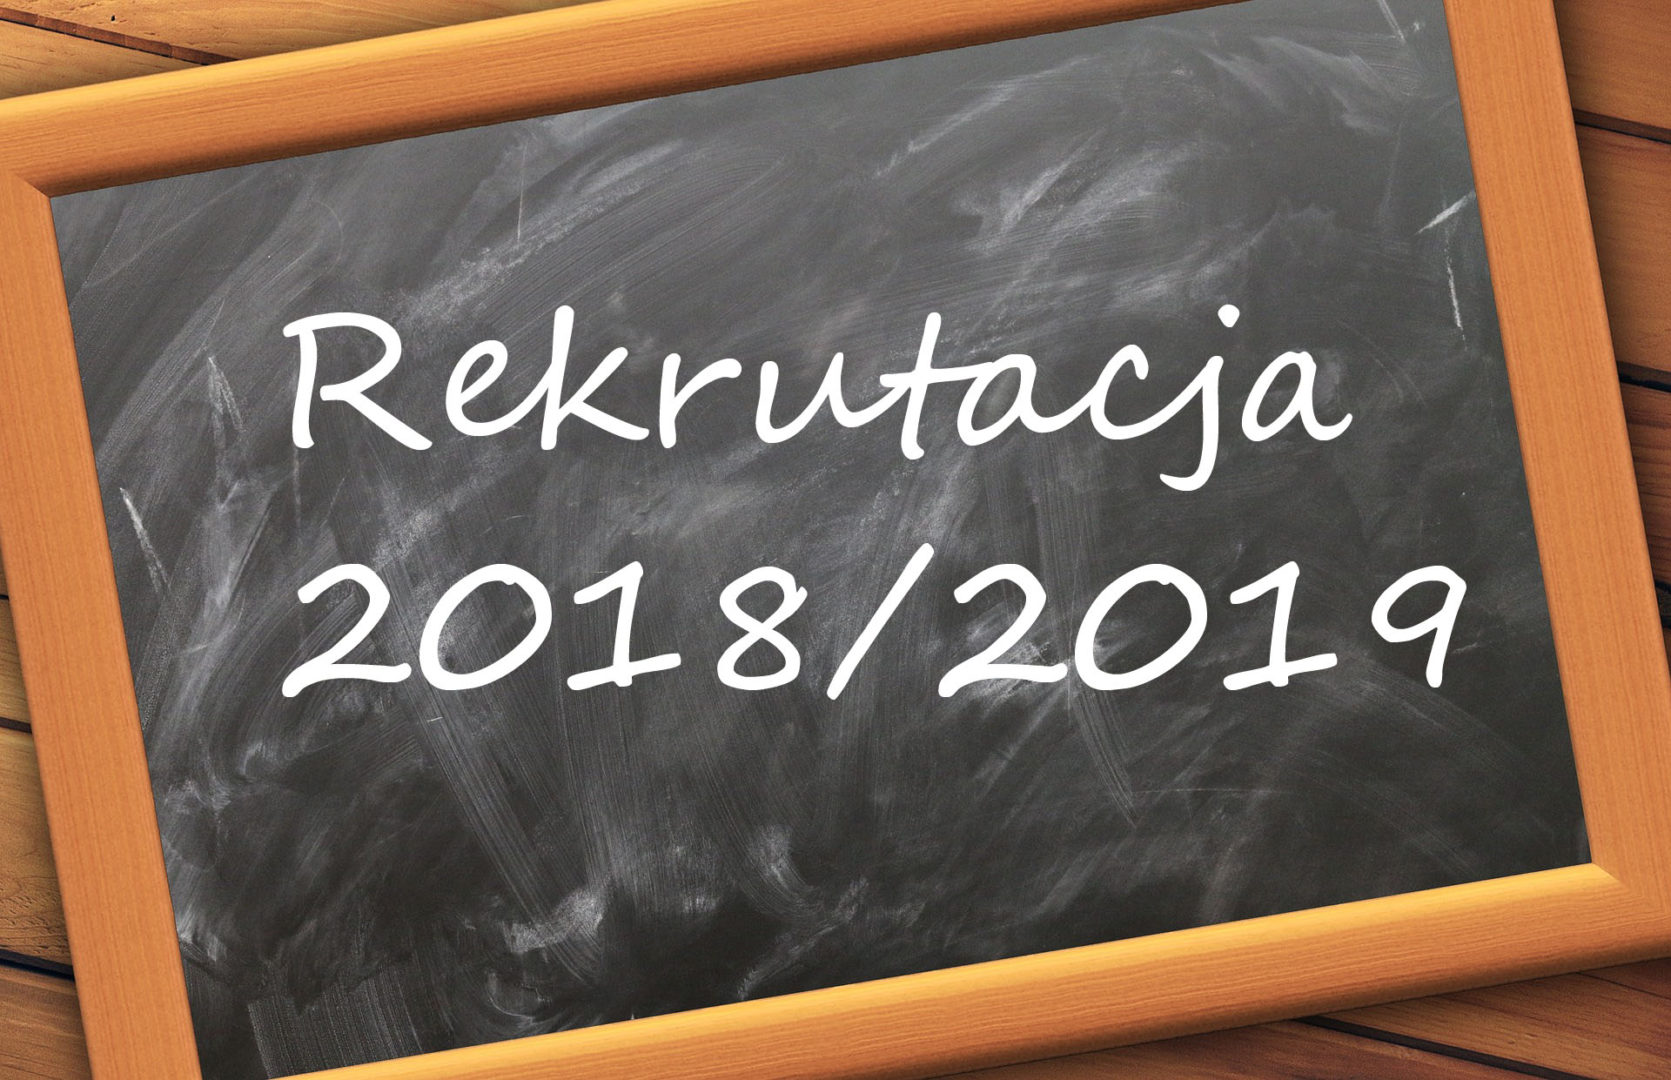 rekrutacja-2018_19